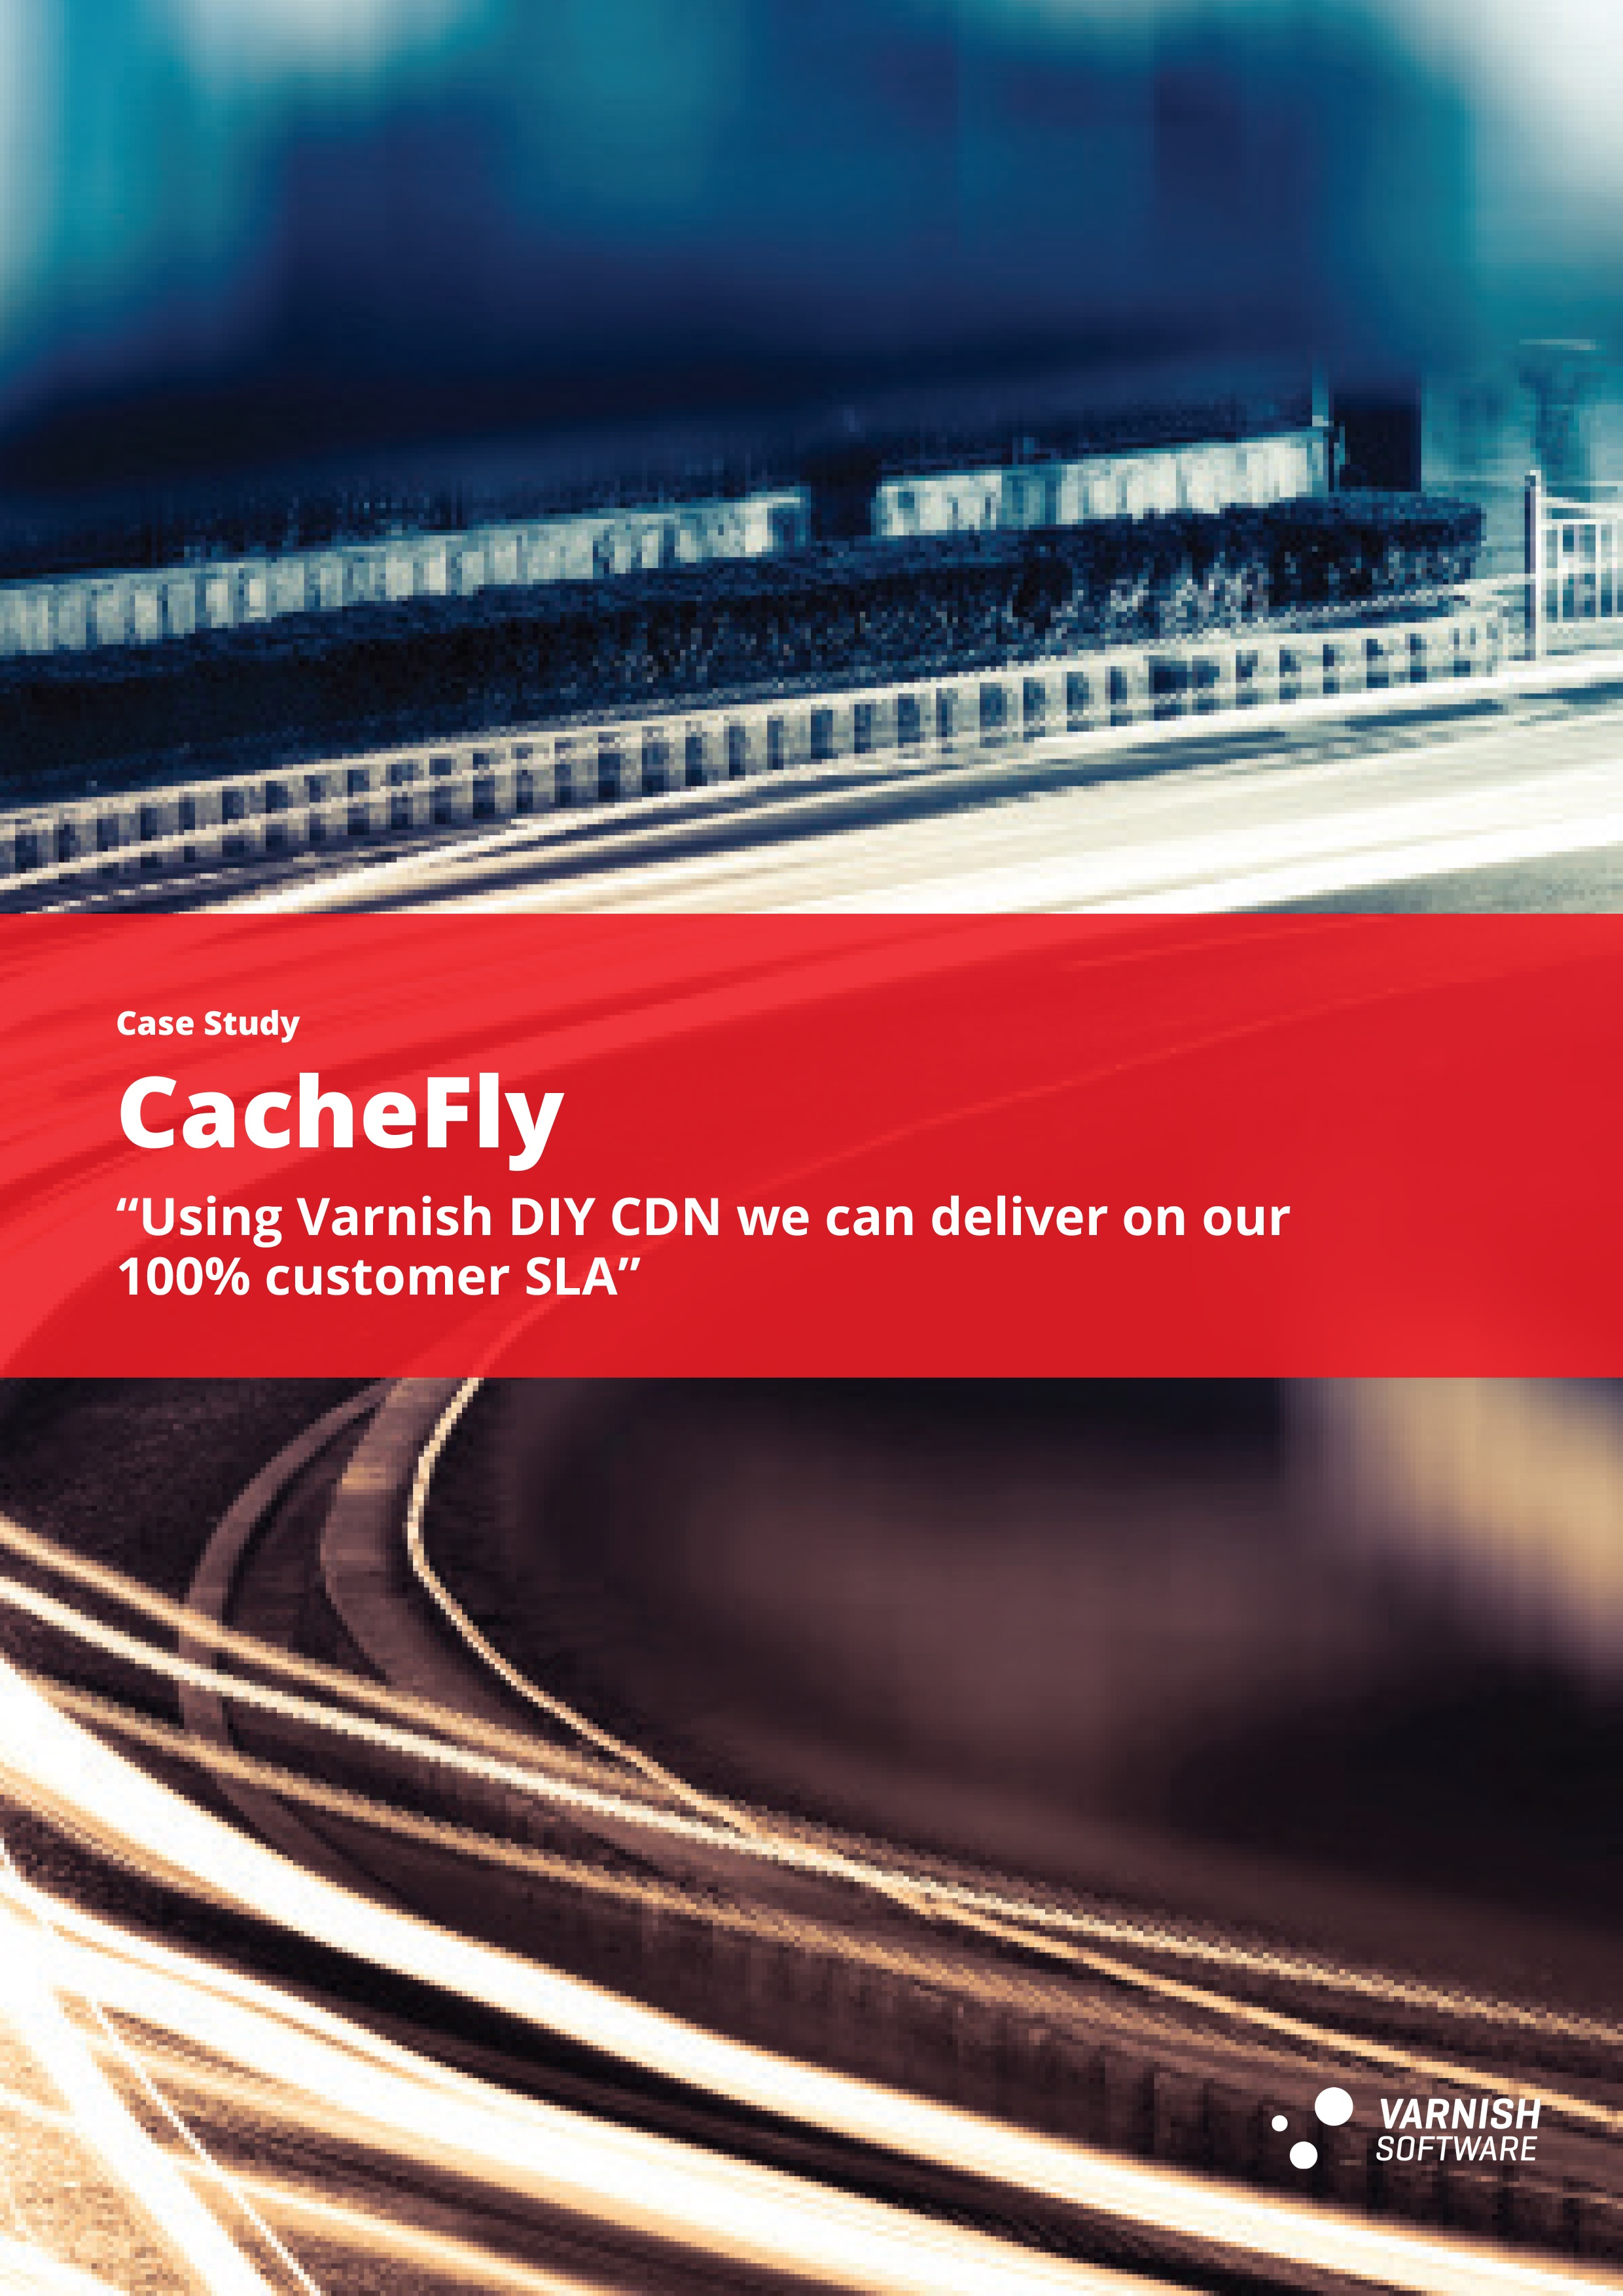 case_CacheFly_Page_1.jpg